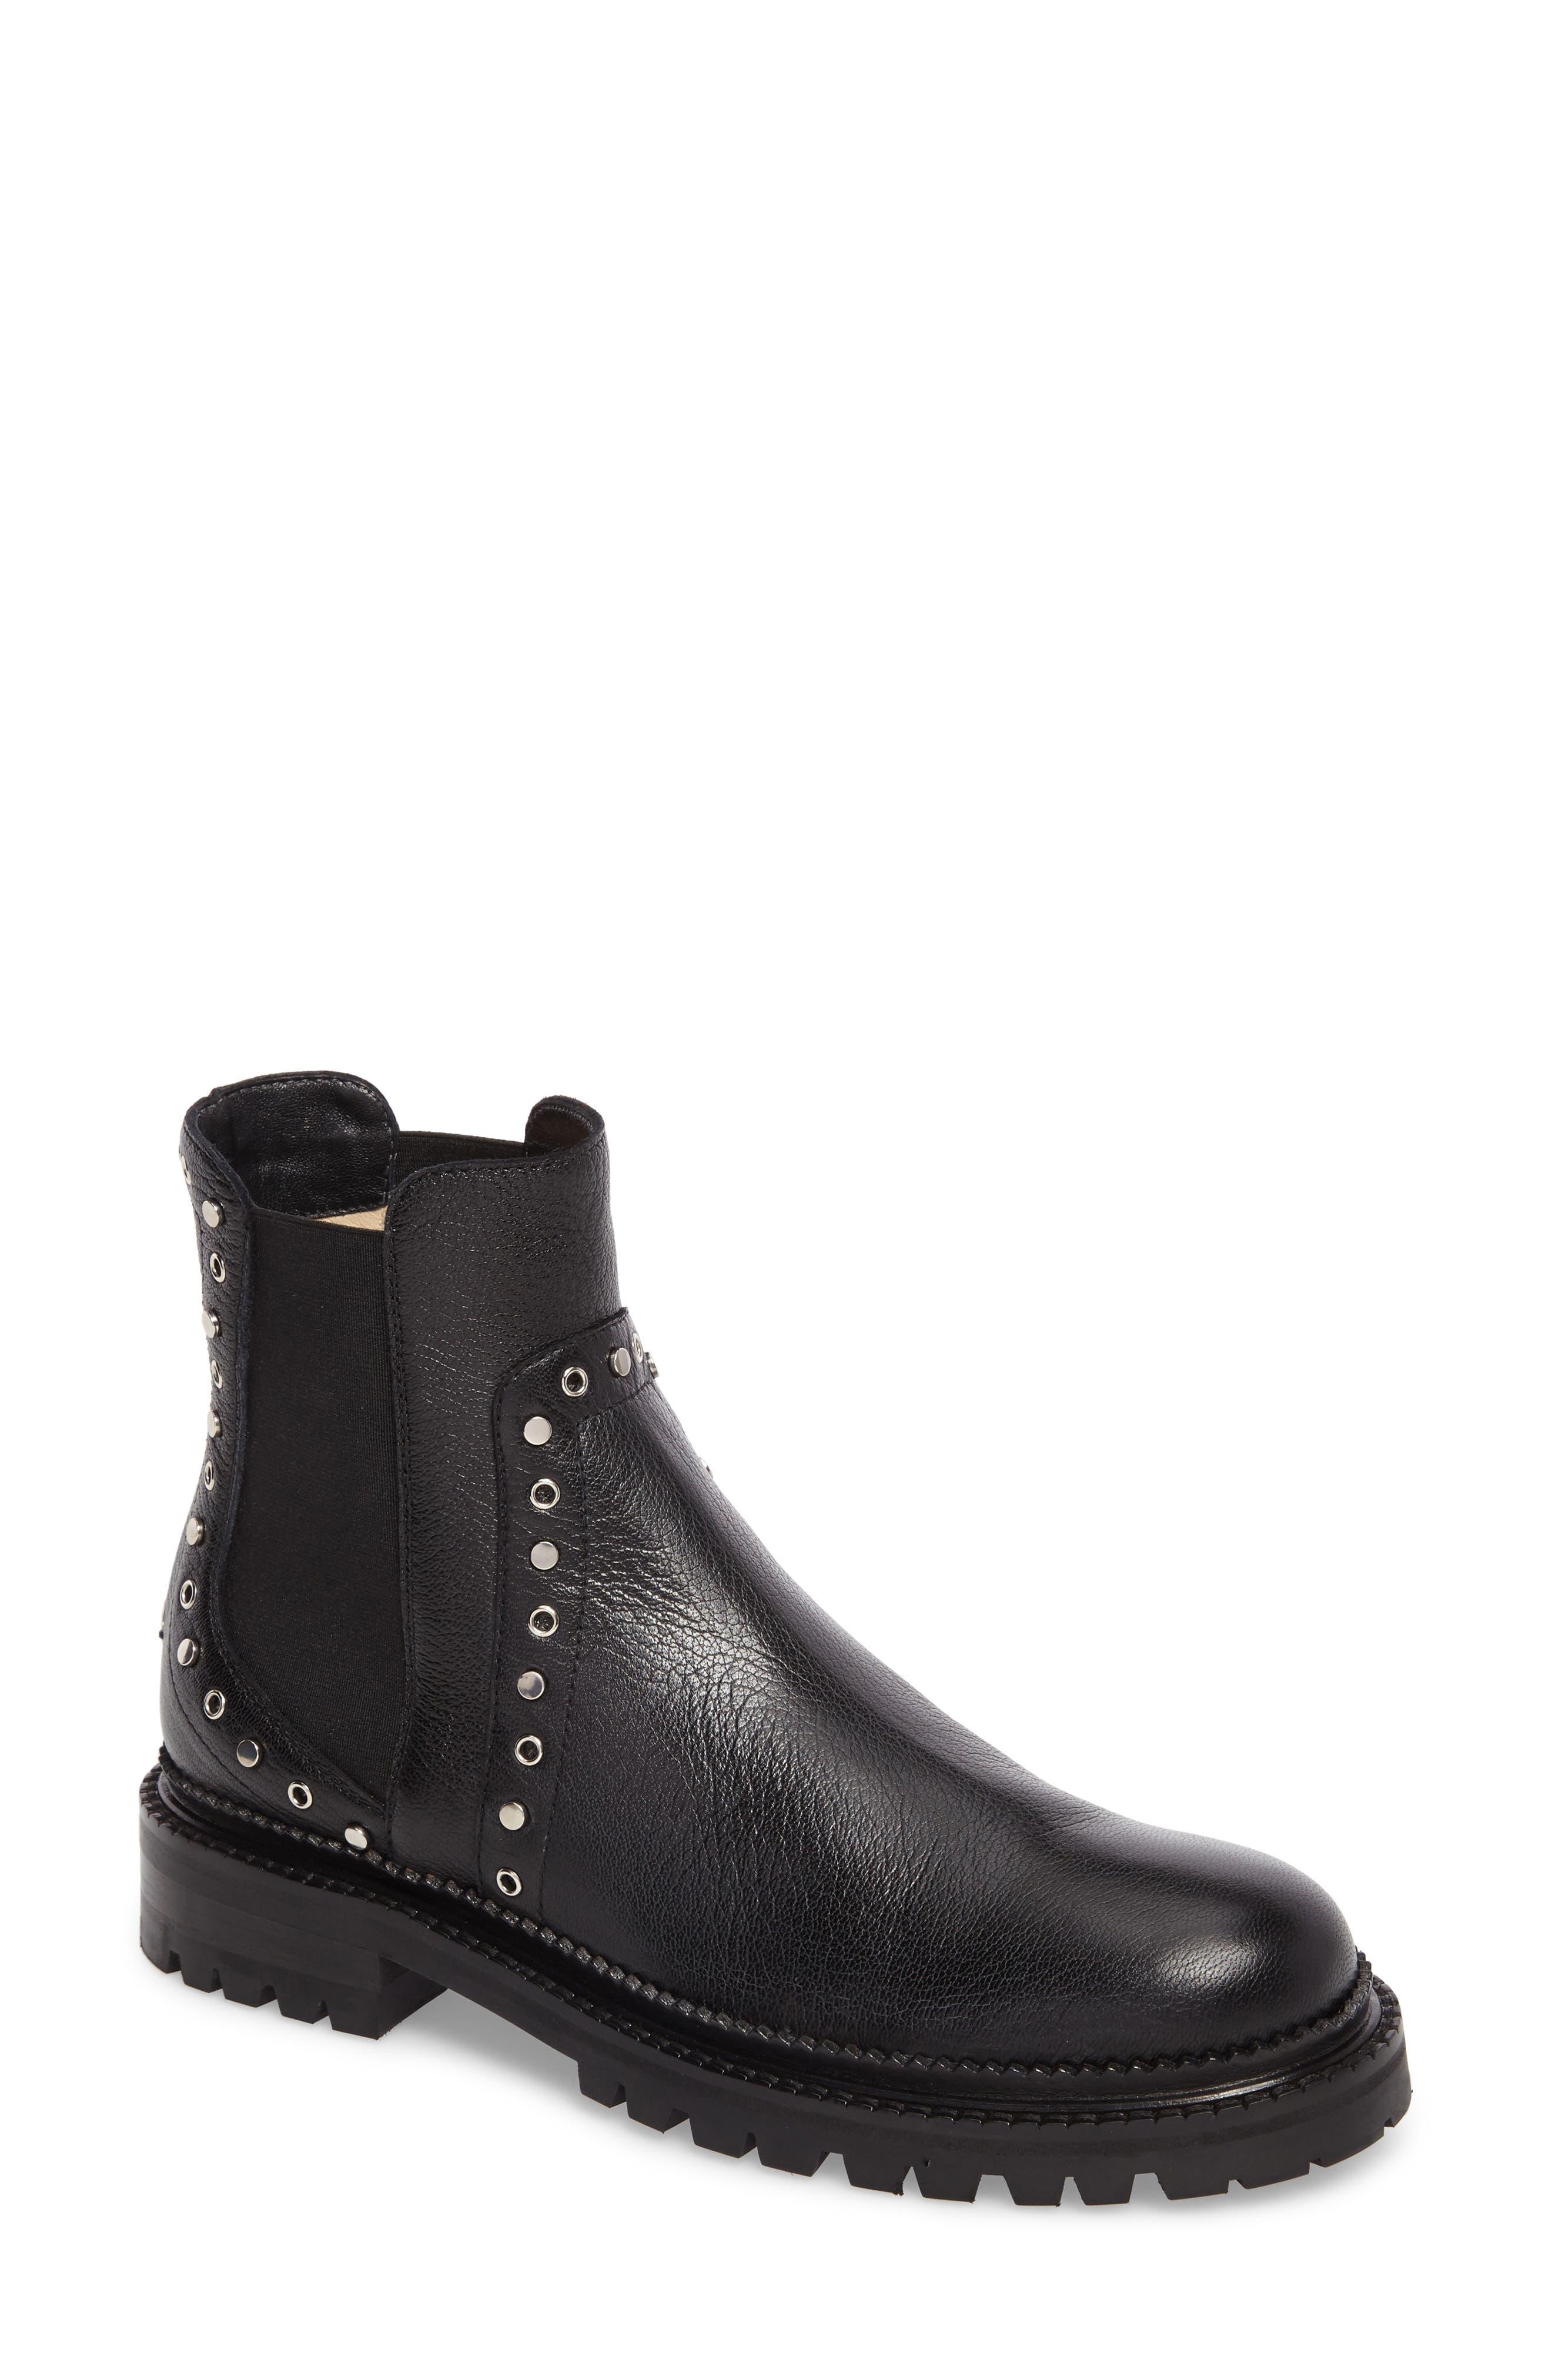 Burrow Chelsea Boot,                         Main,                         color, 001